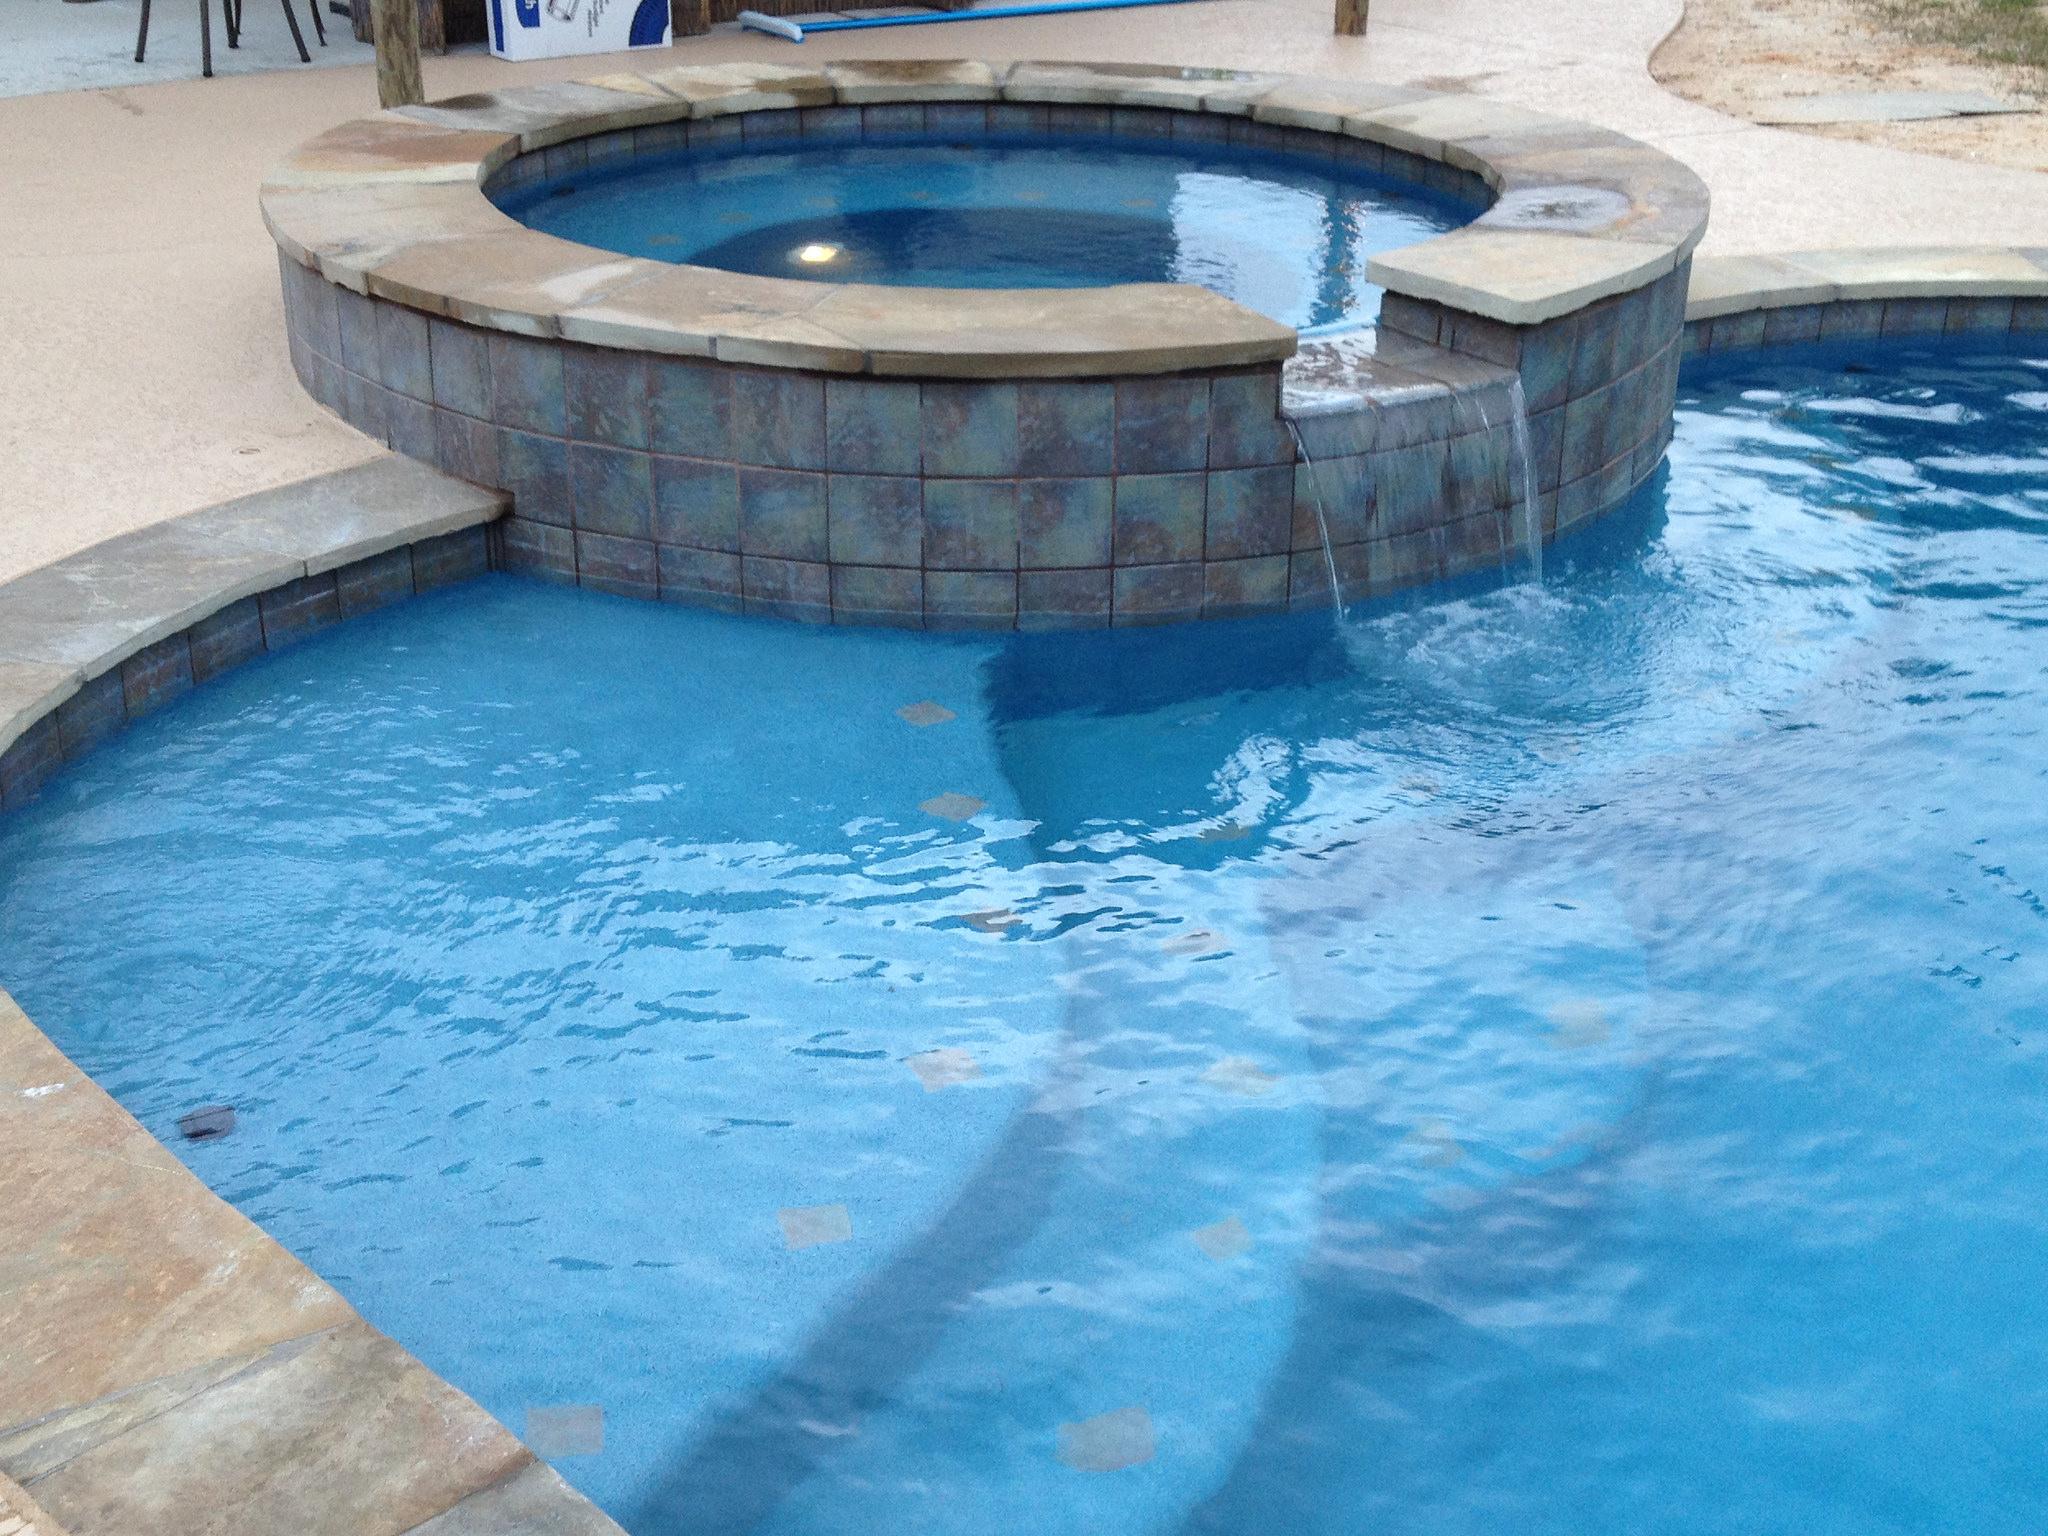 Custom Pool Design: Focus on Water Features